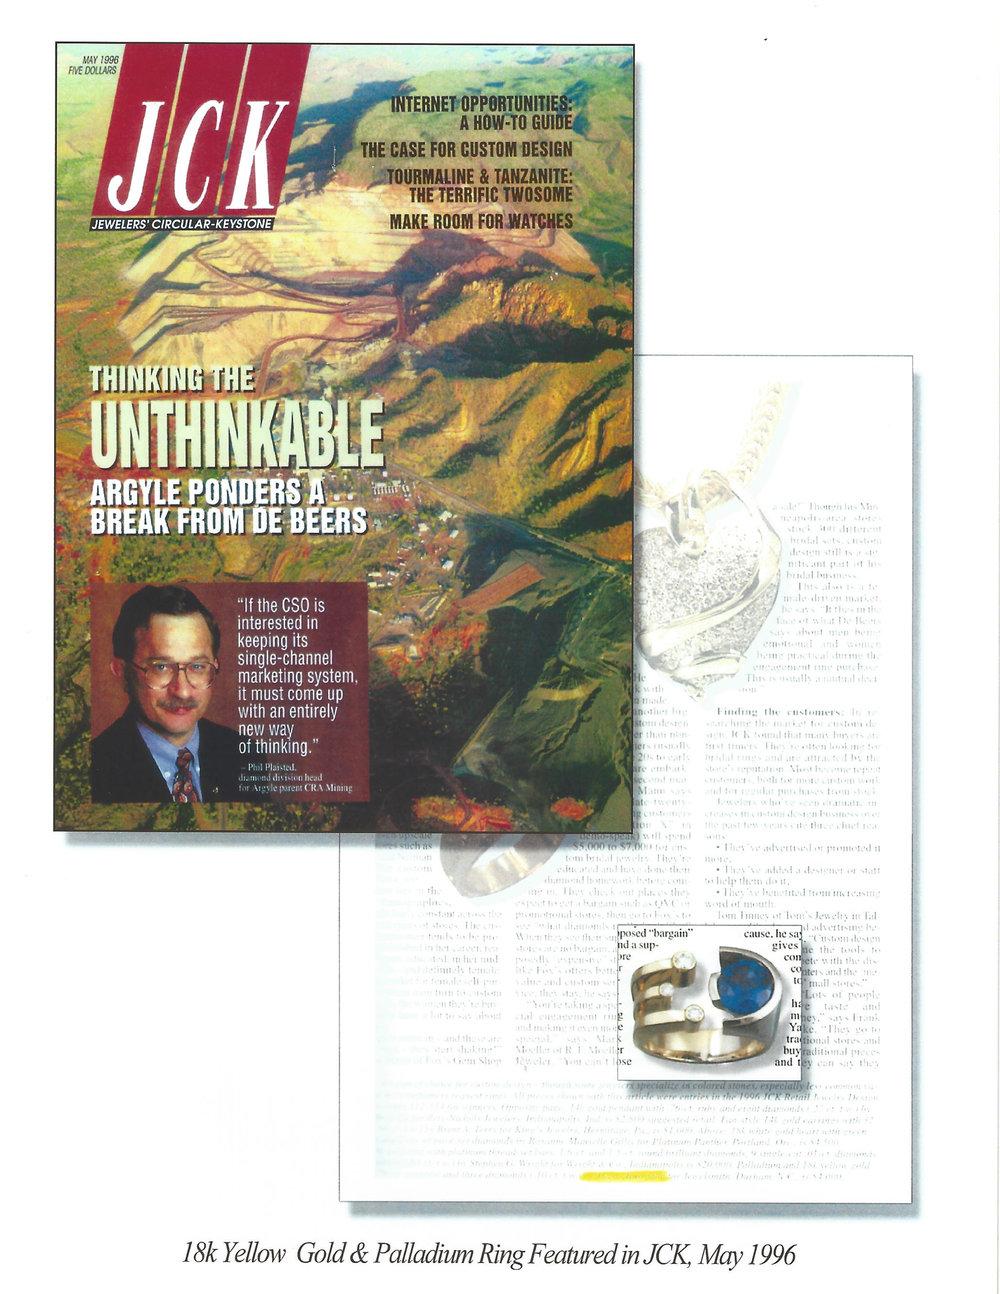 jck-may-1996.jpg